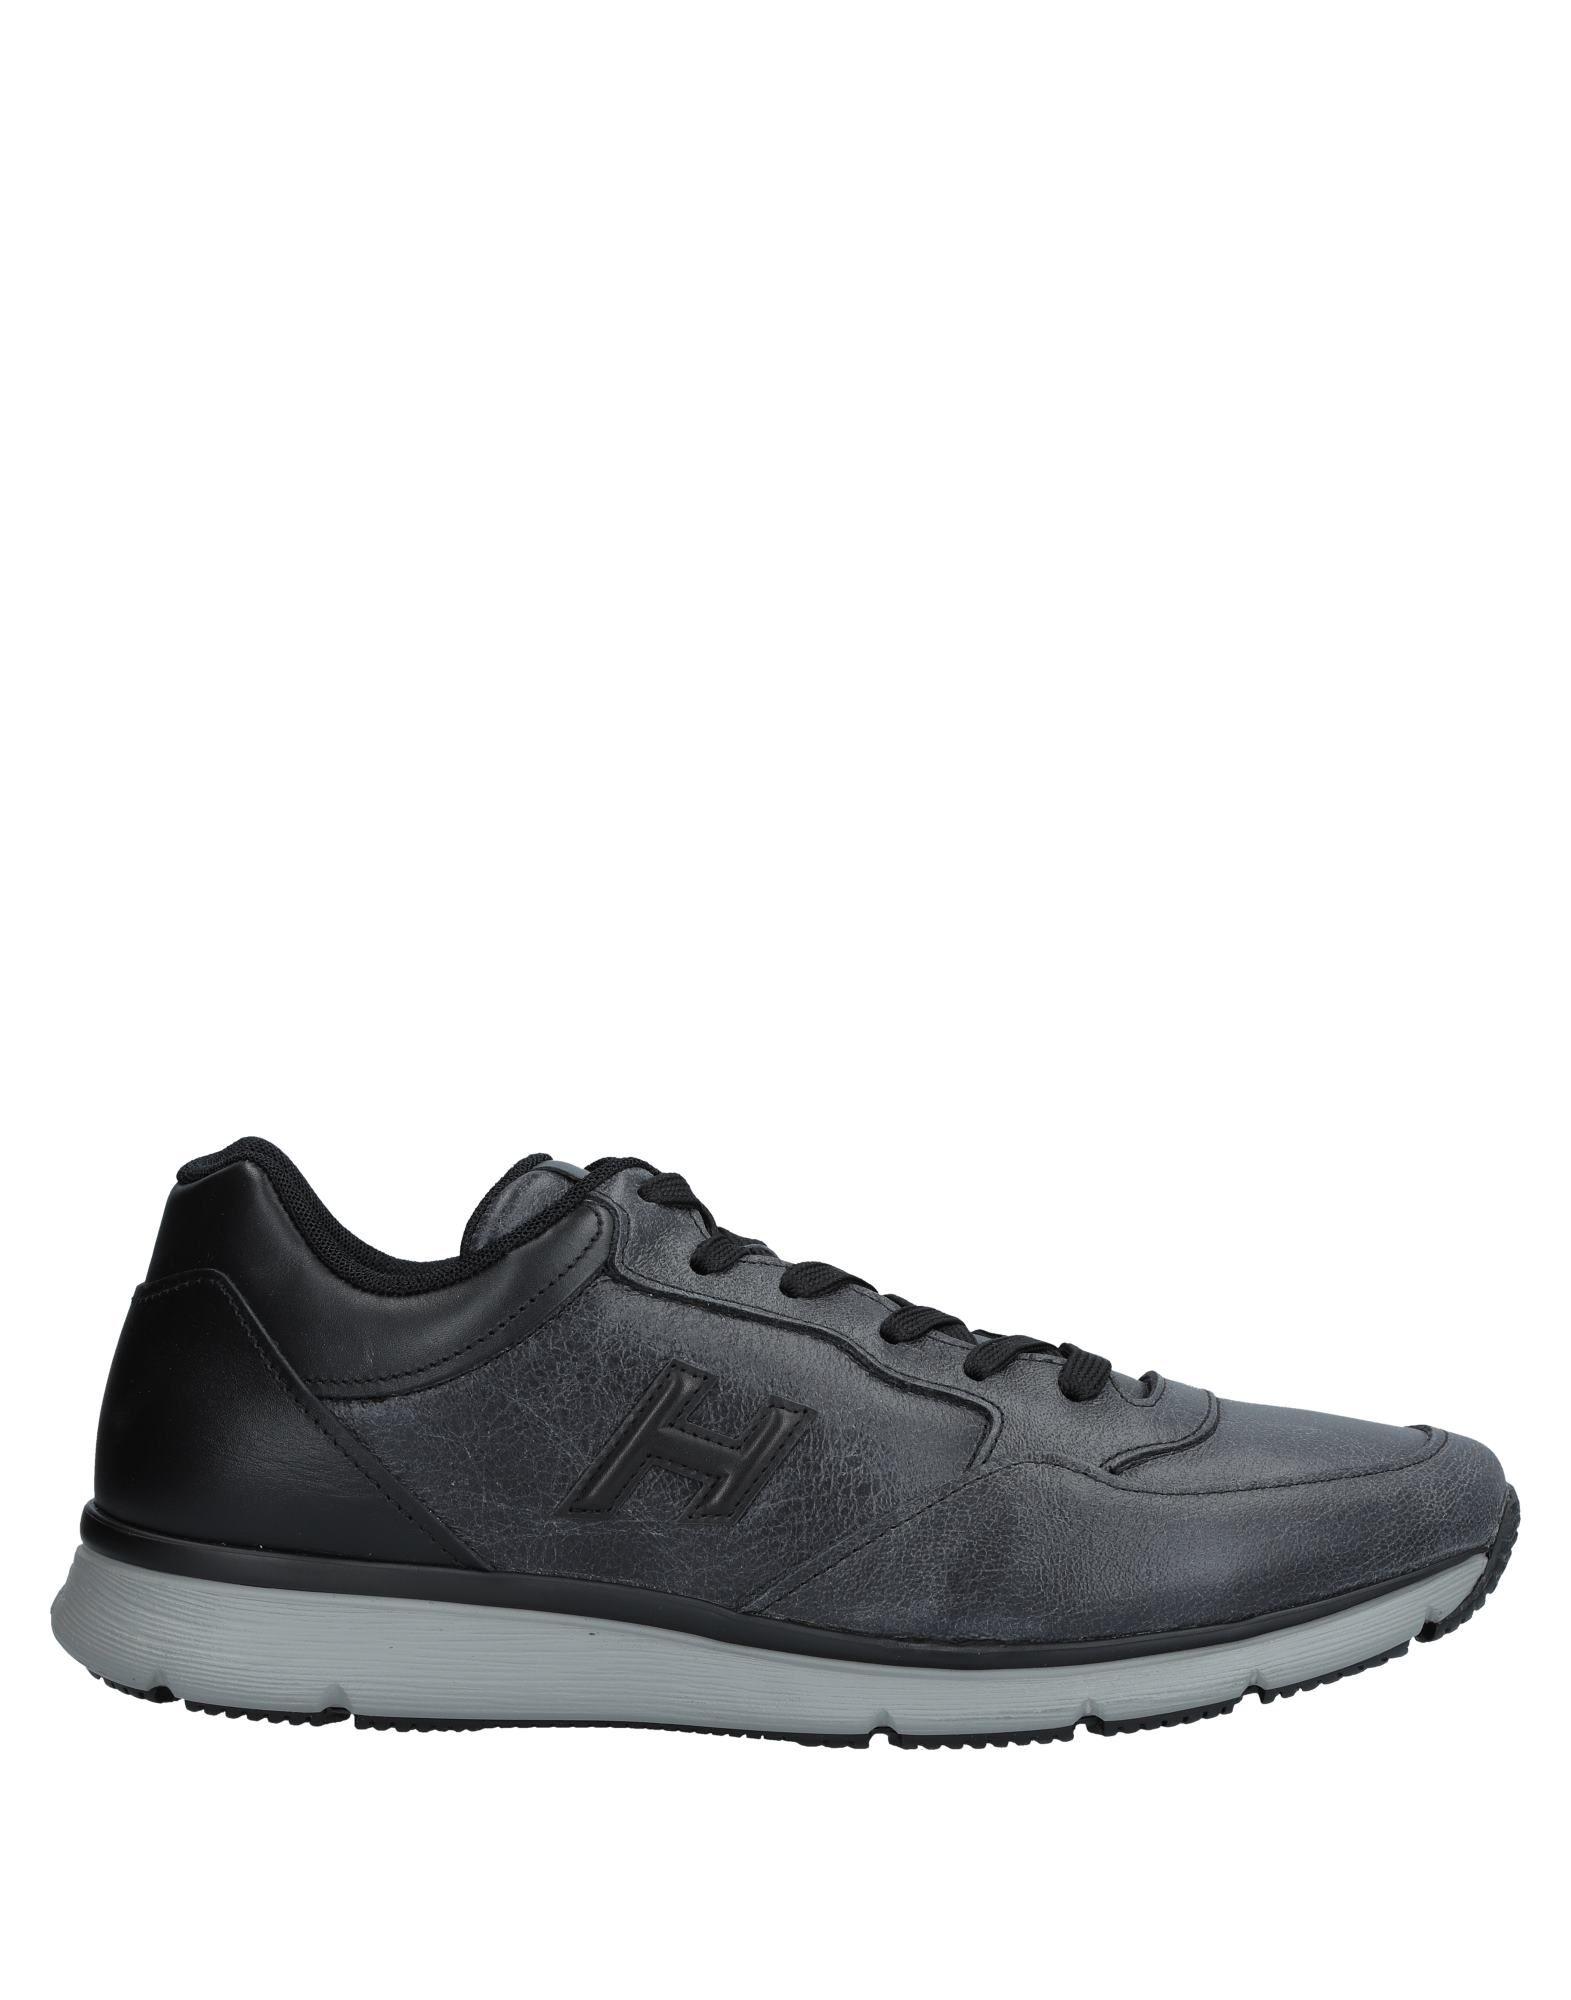 Hogan Sneakers Herren  11544622VD Gute Qualität beliebte Schuhe